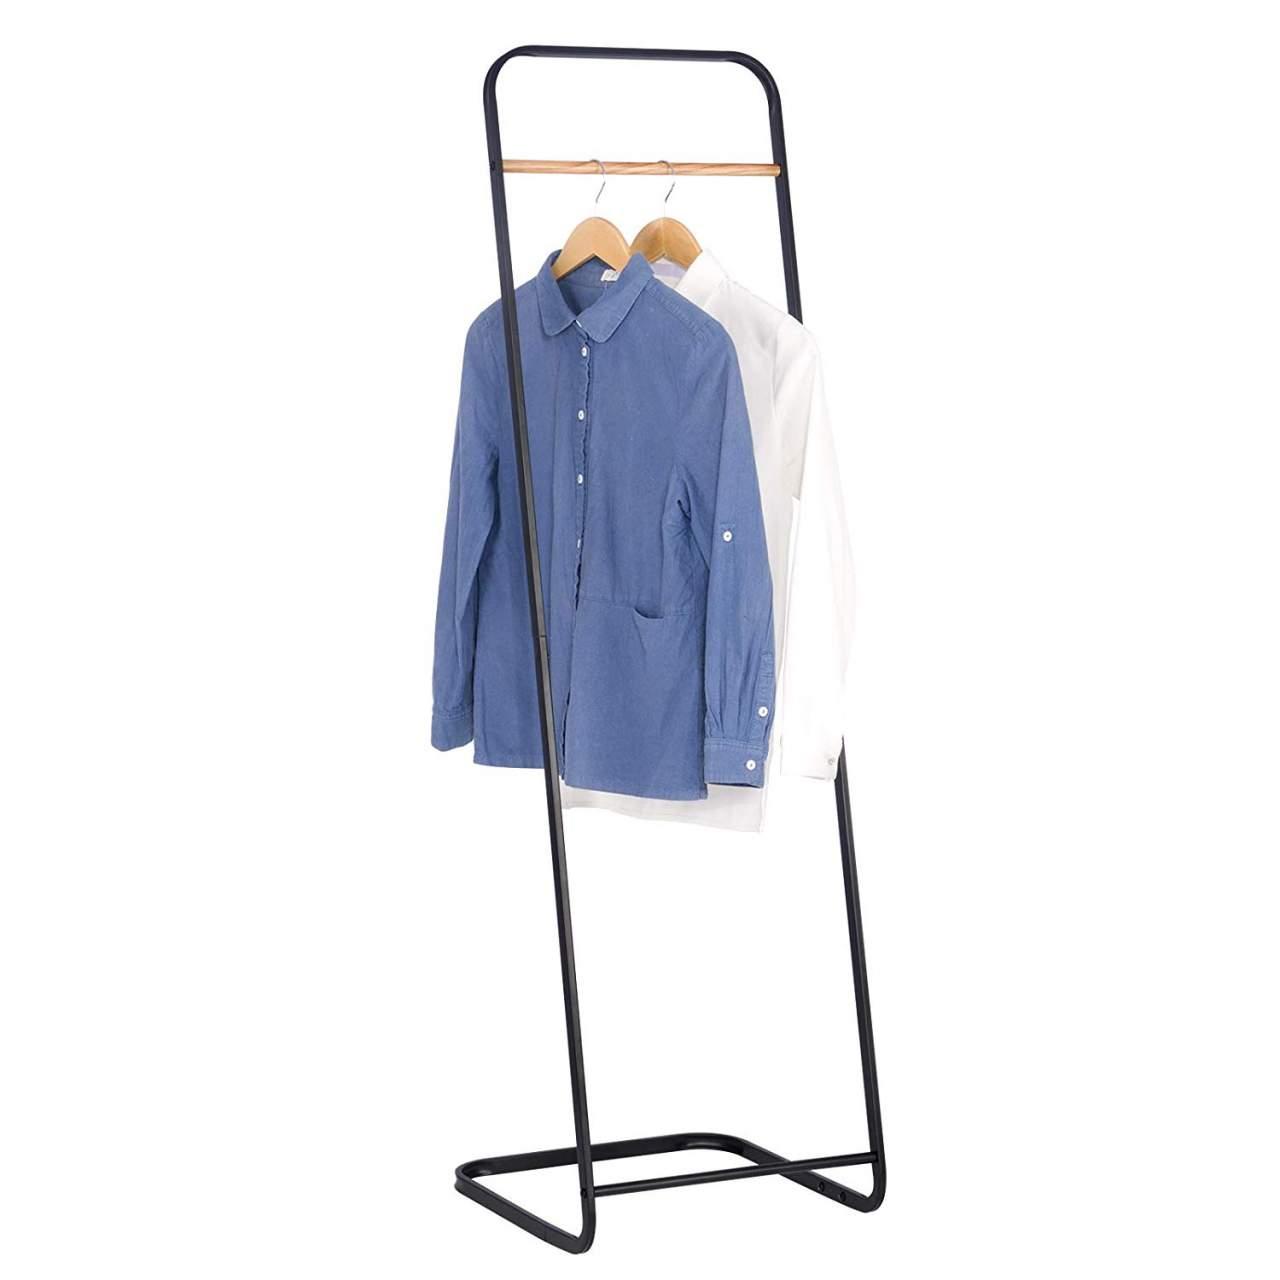 wall coat racks stand clothes rail heavy duty garment rack entrance hall hanging rack metal